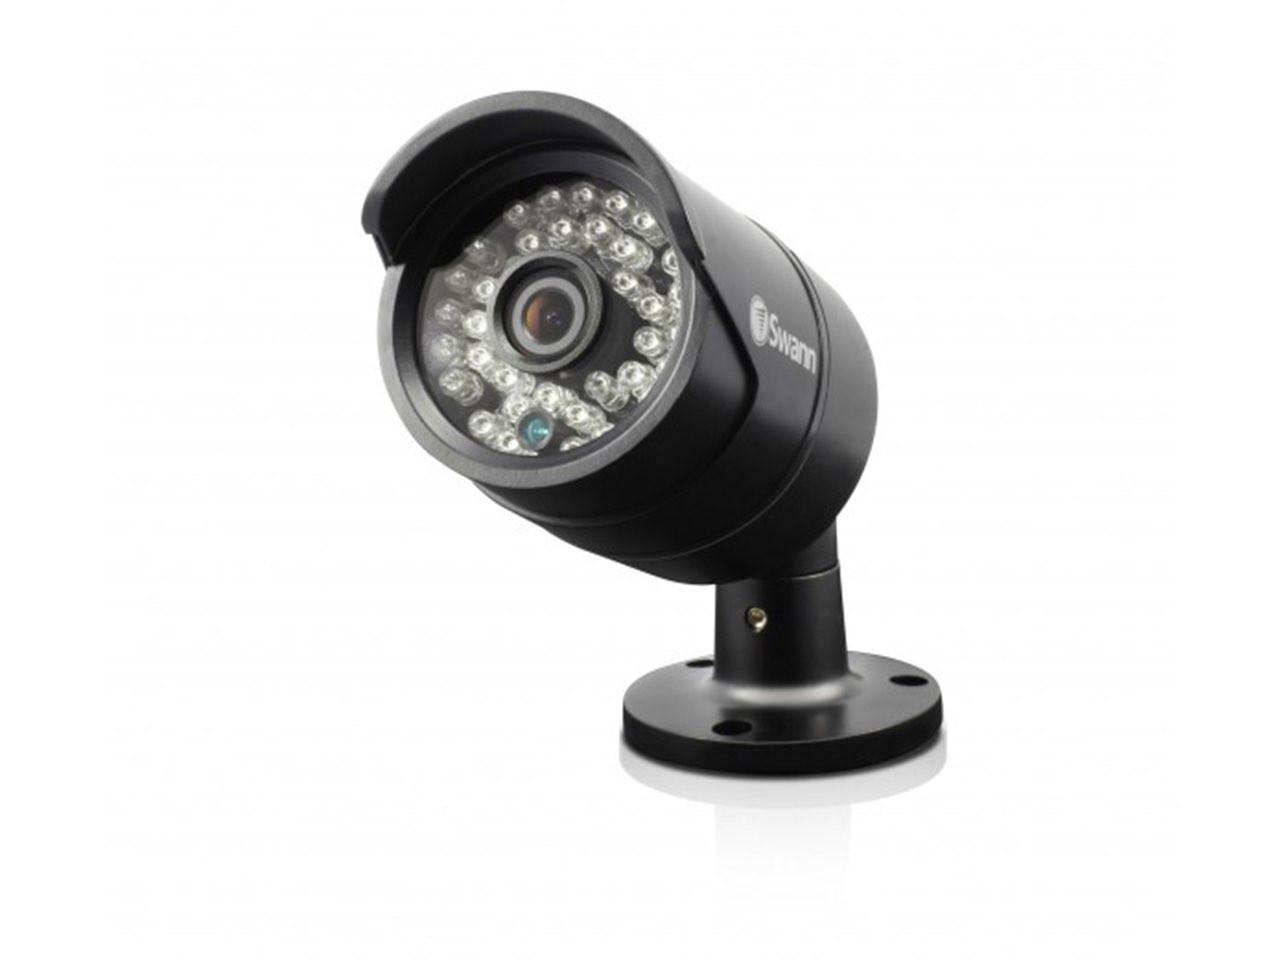 Swann 720p Multi-Purpose Bullet Security Camera